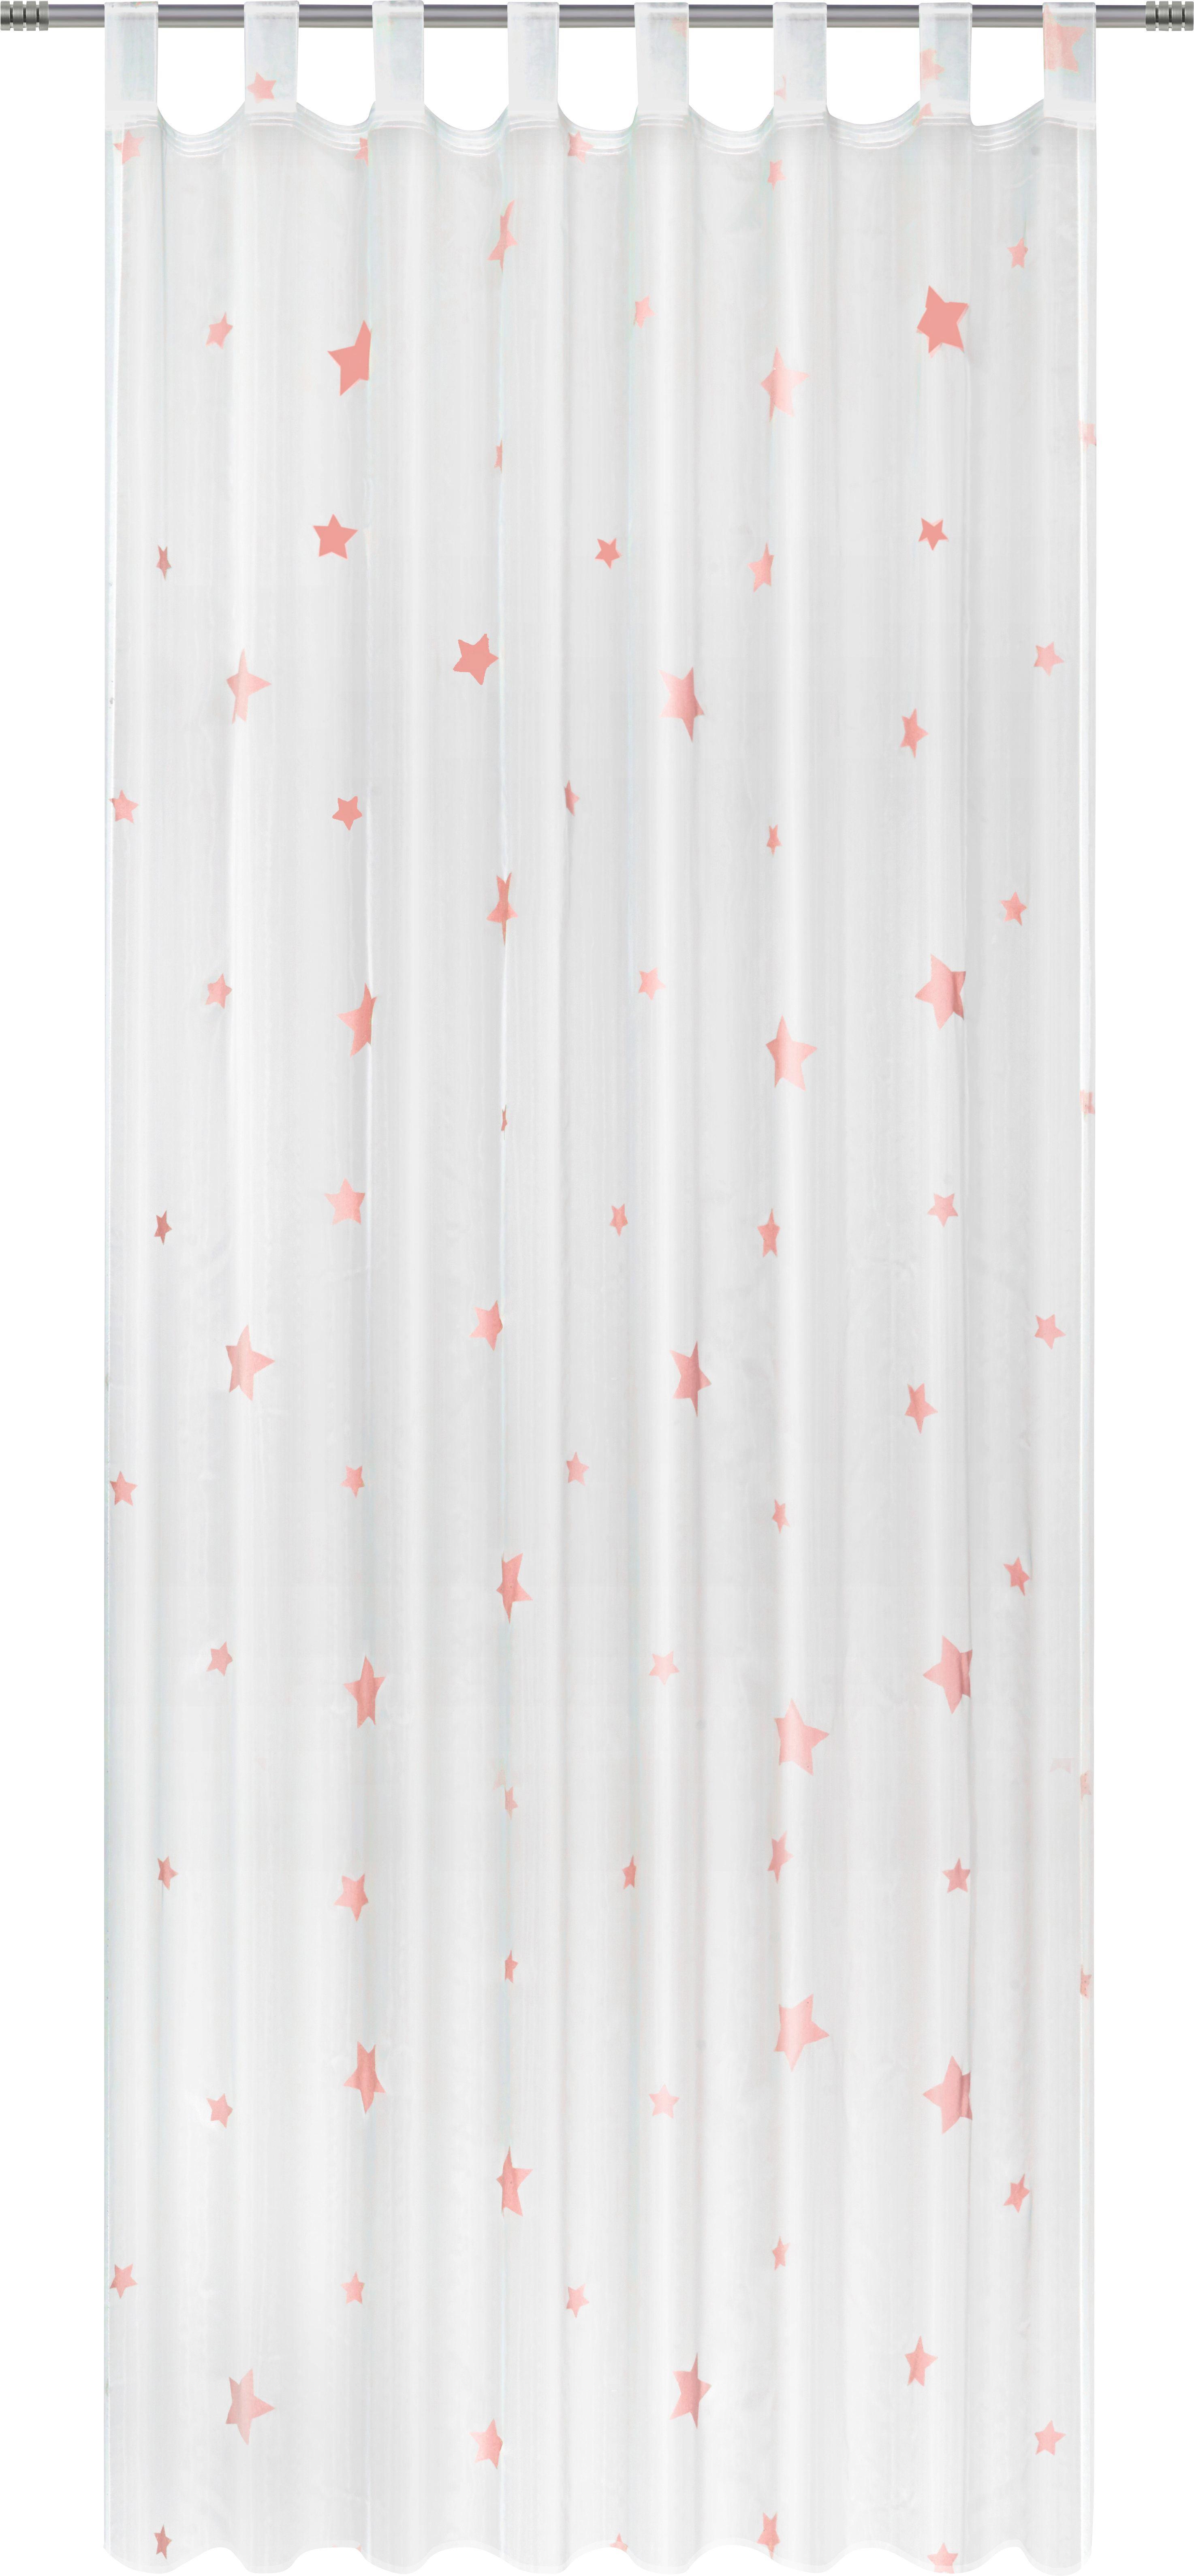 Schlaufenschal Claudia, ca. 140x245cm - Pink/Weiß, ROMANTIK / LANDHAUS, Textil (140/245cm) - MÖMAX modern living